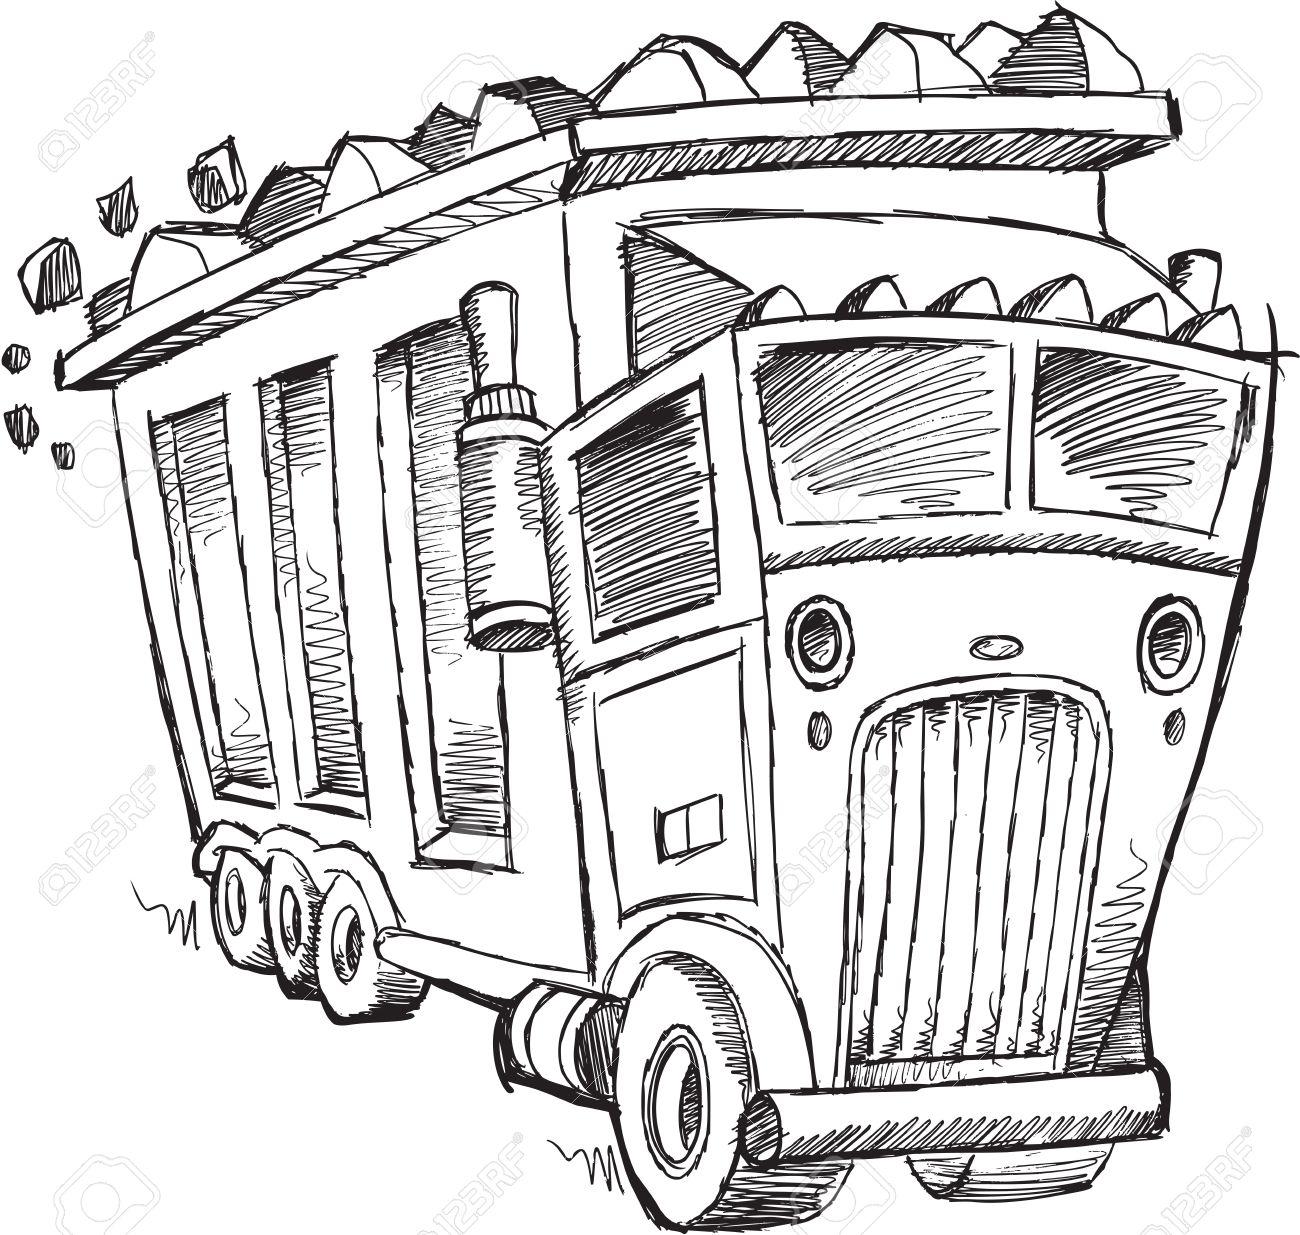 truck sketch drawing at getdrawings com